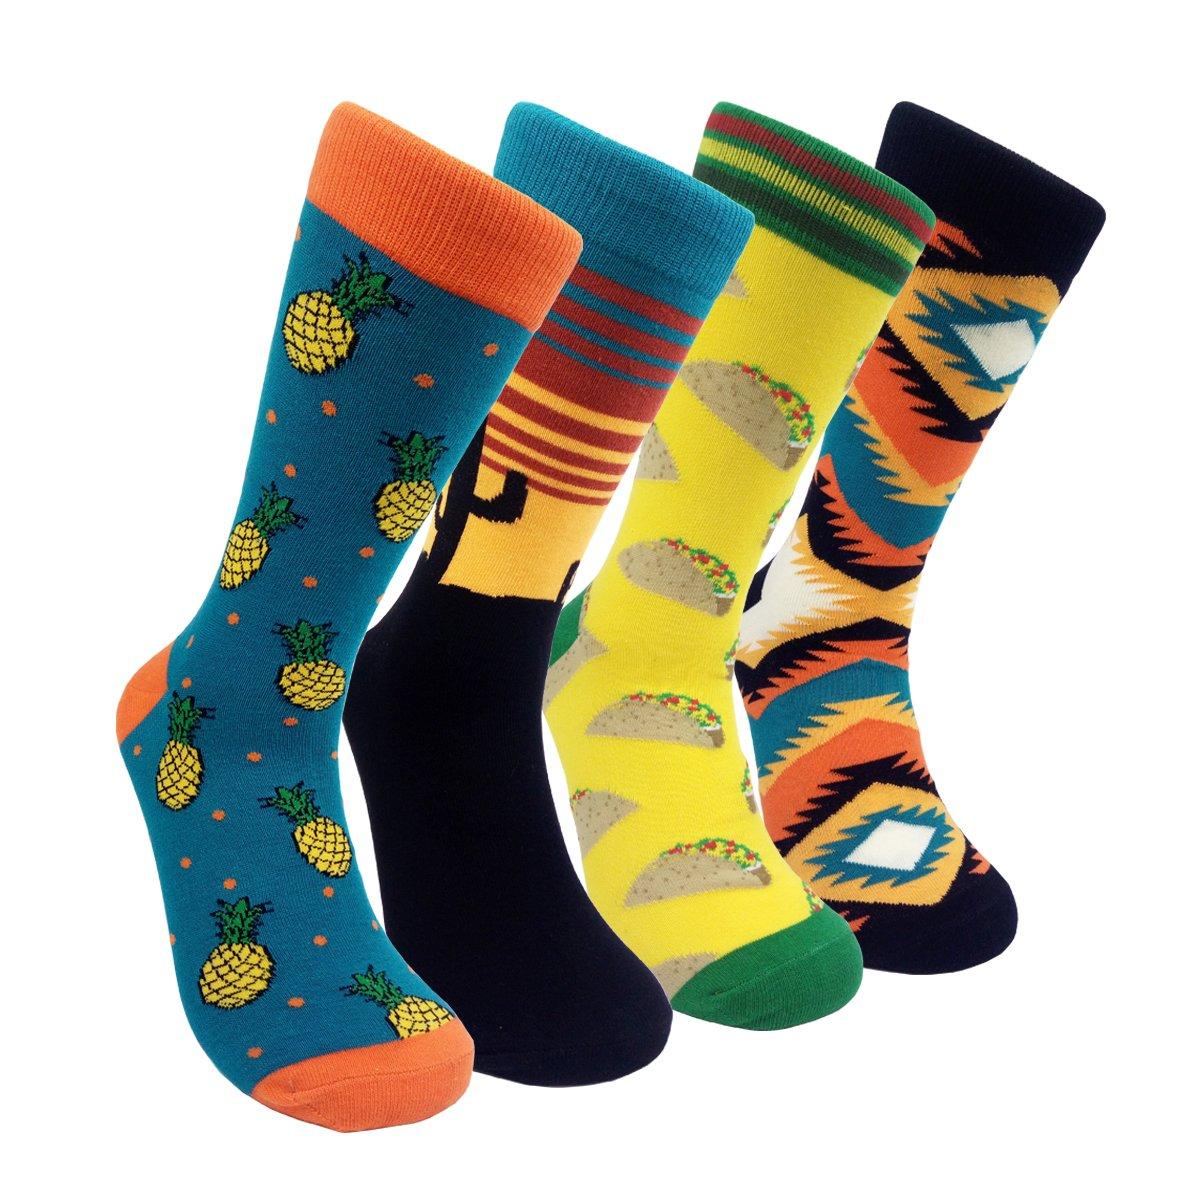 Mens Colorful Dress Socks Argyle – HSELL Men Multicolored Pattern Fashionable Fun Crew Socks 4 Pack (Cactus 4 Pack) …